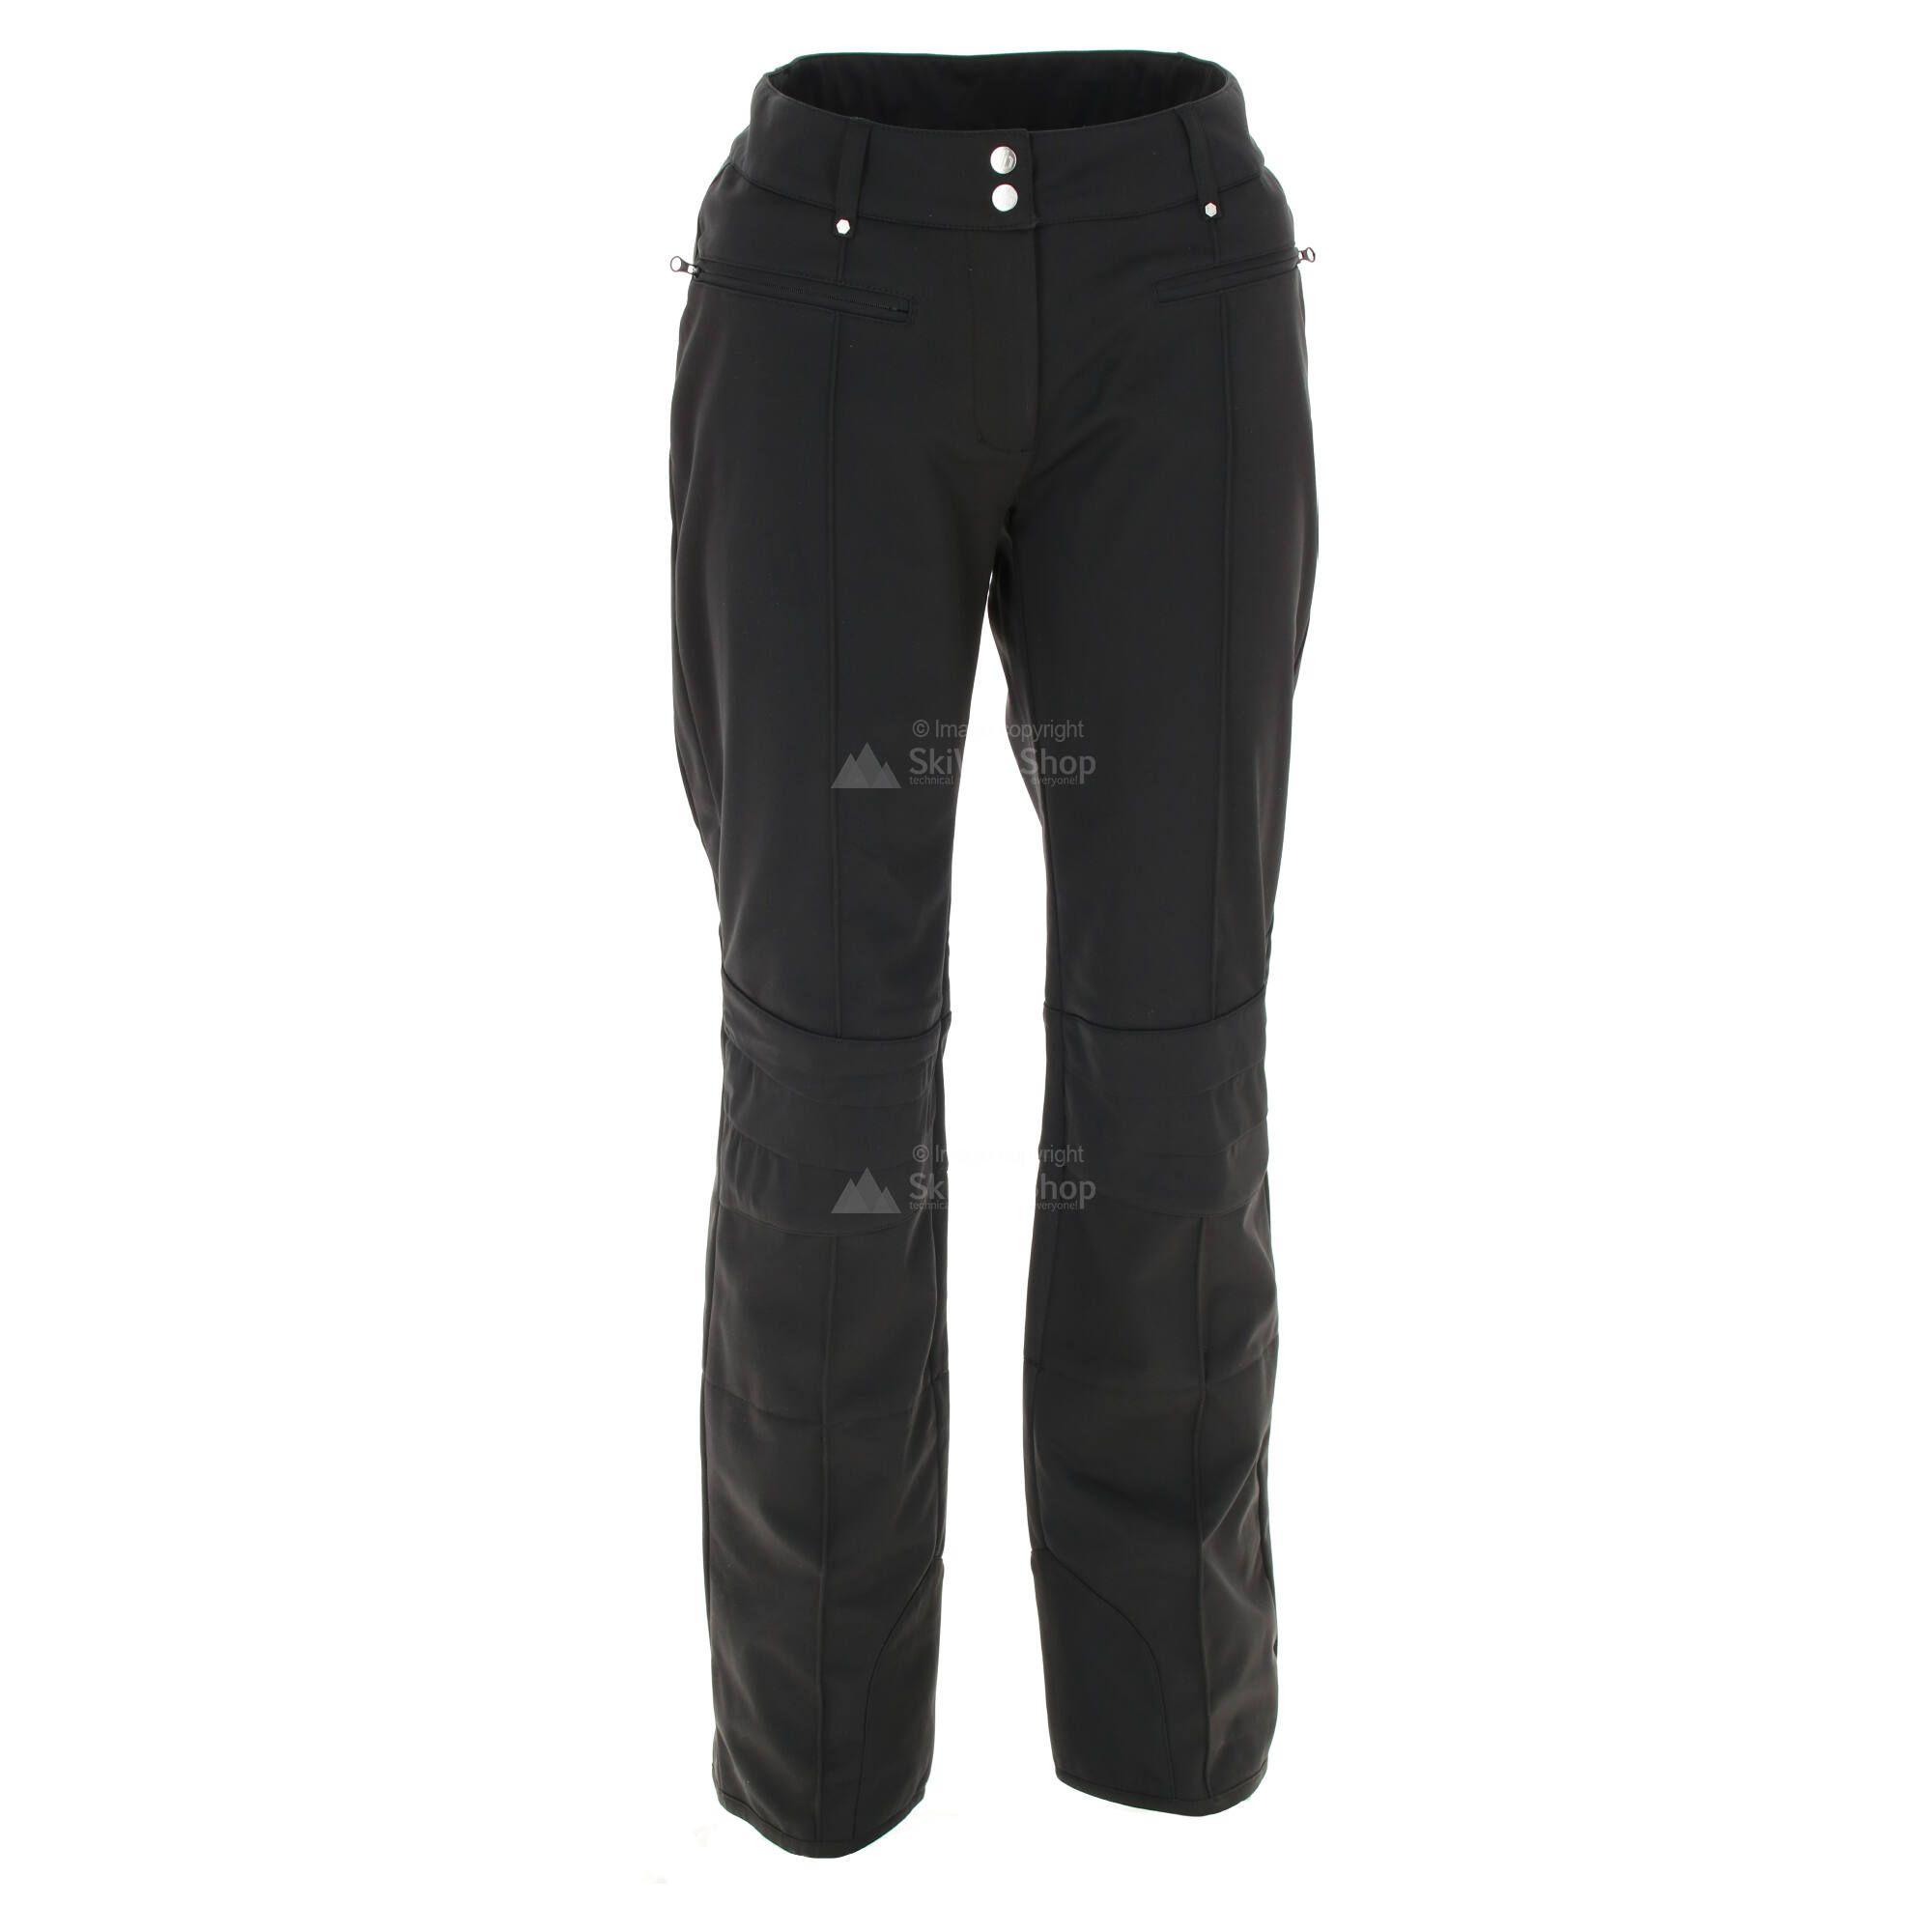 Dare 2B Women/'s Stand For Ski Pants Black